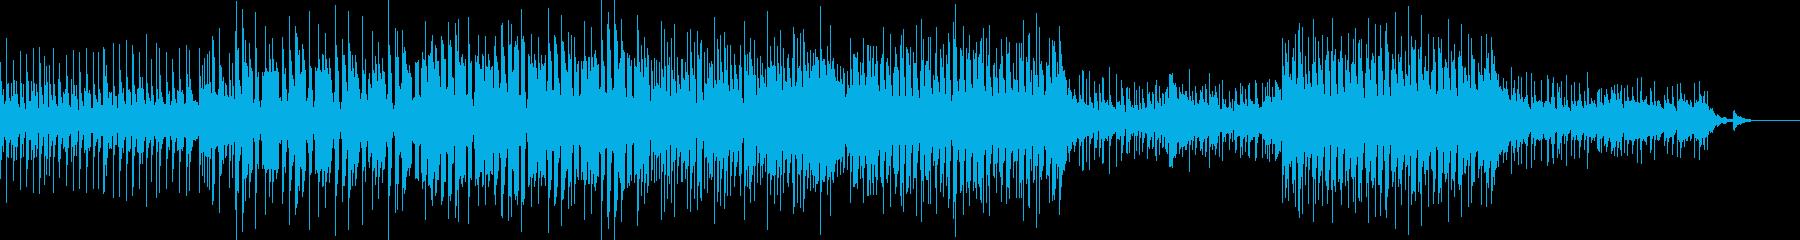 ★kawaiiフューチャーベースPOP3の再生済みの波形